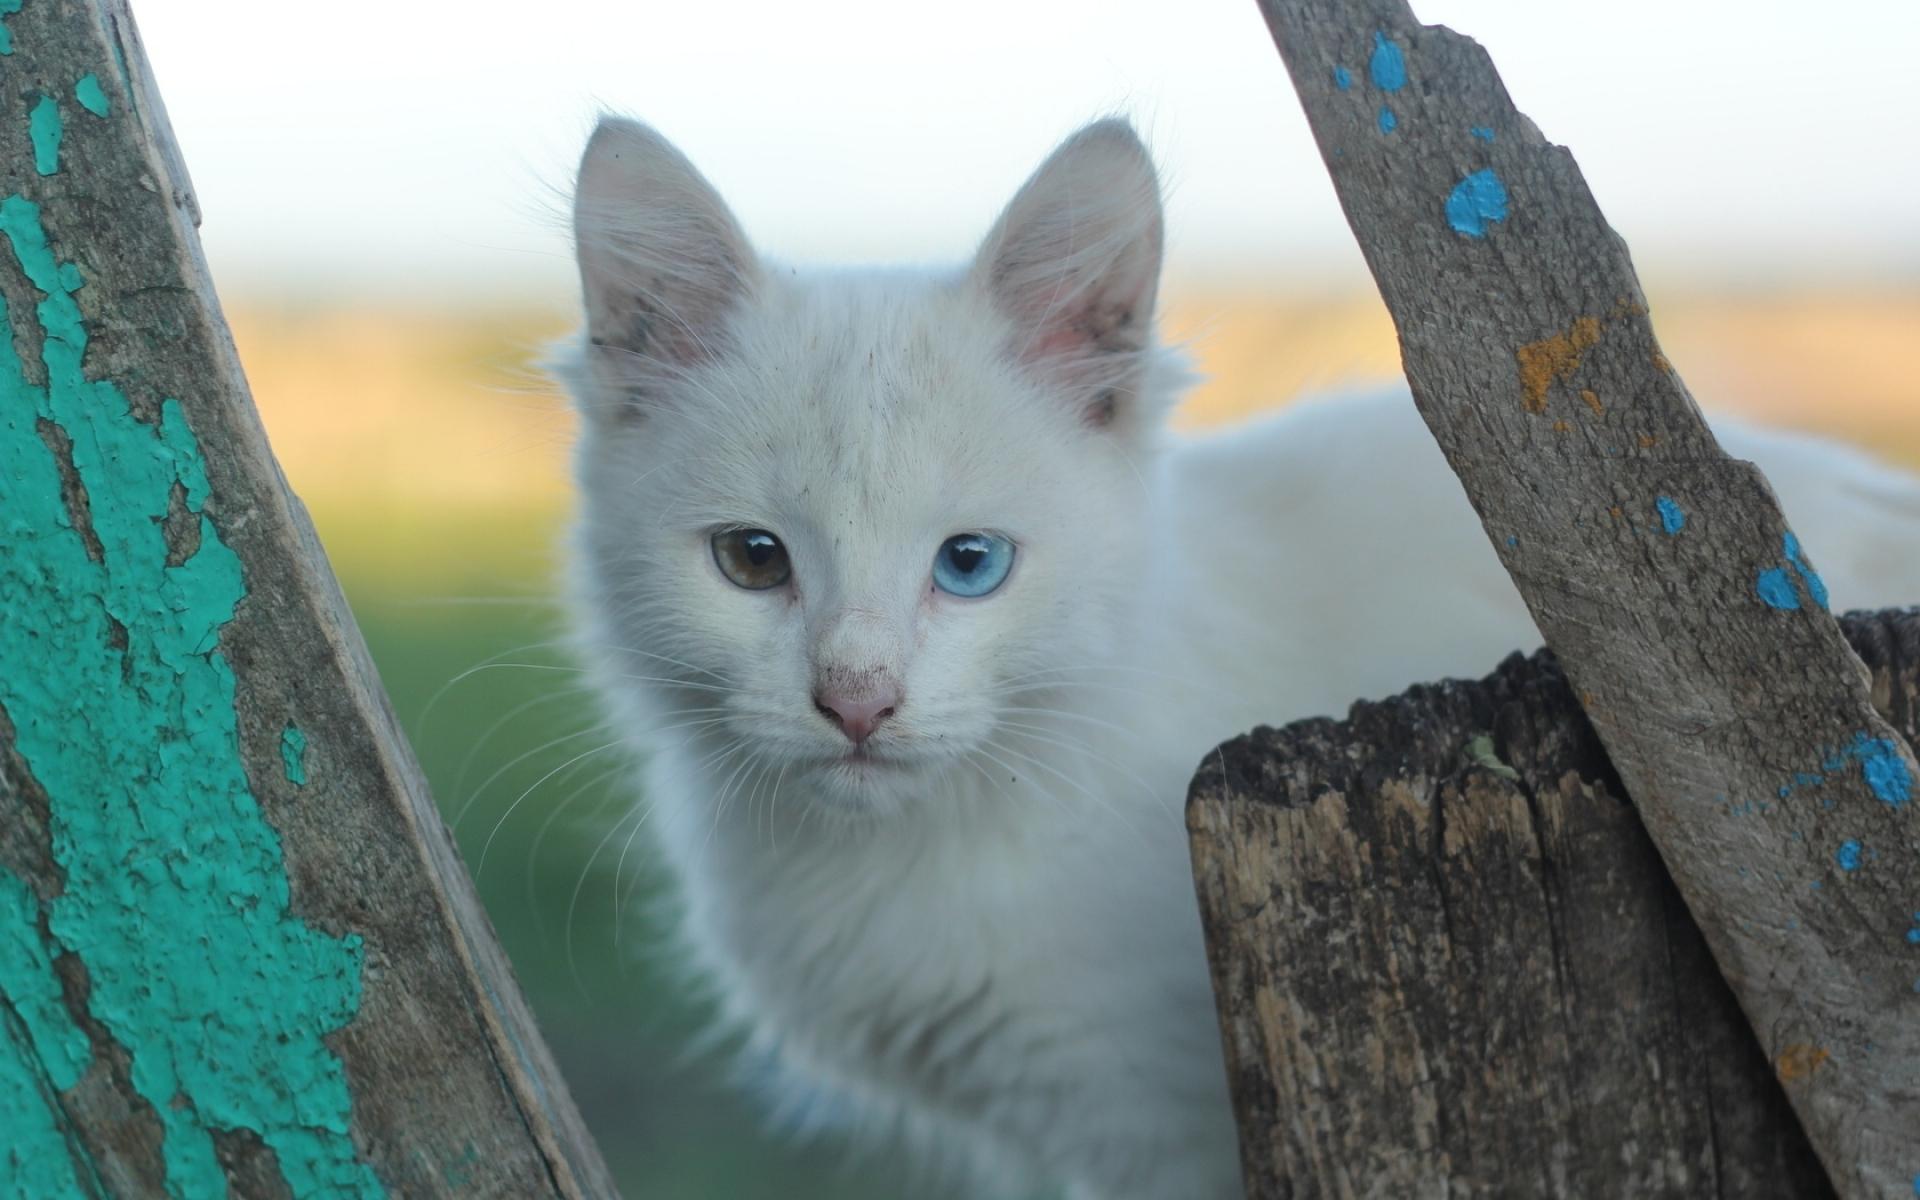 Картинки Гетерохромия, белая кошка, кошка, морда фото и обои на рабочий стол